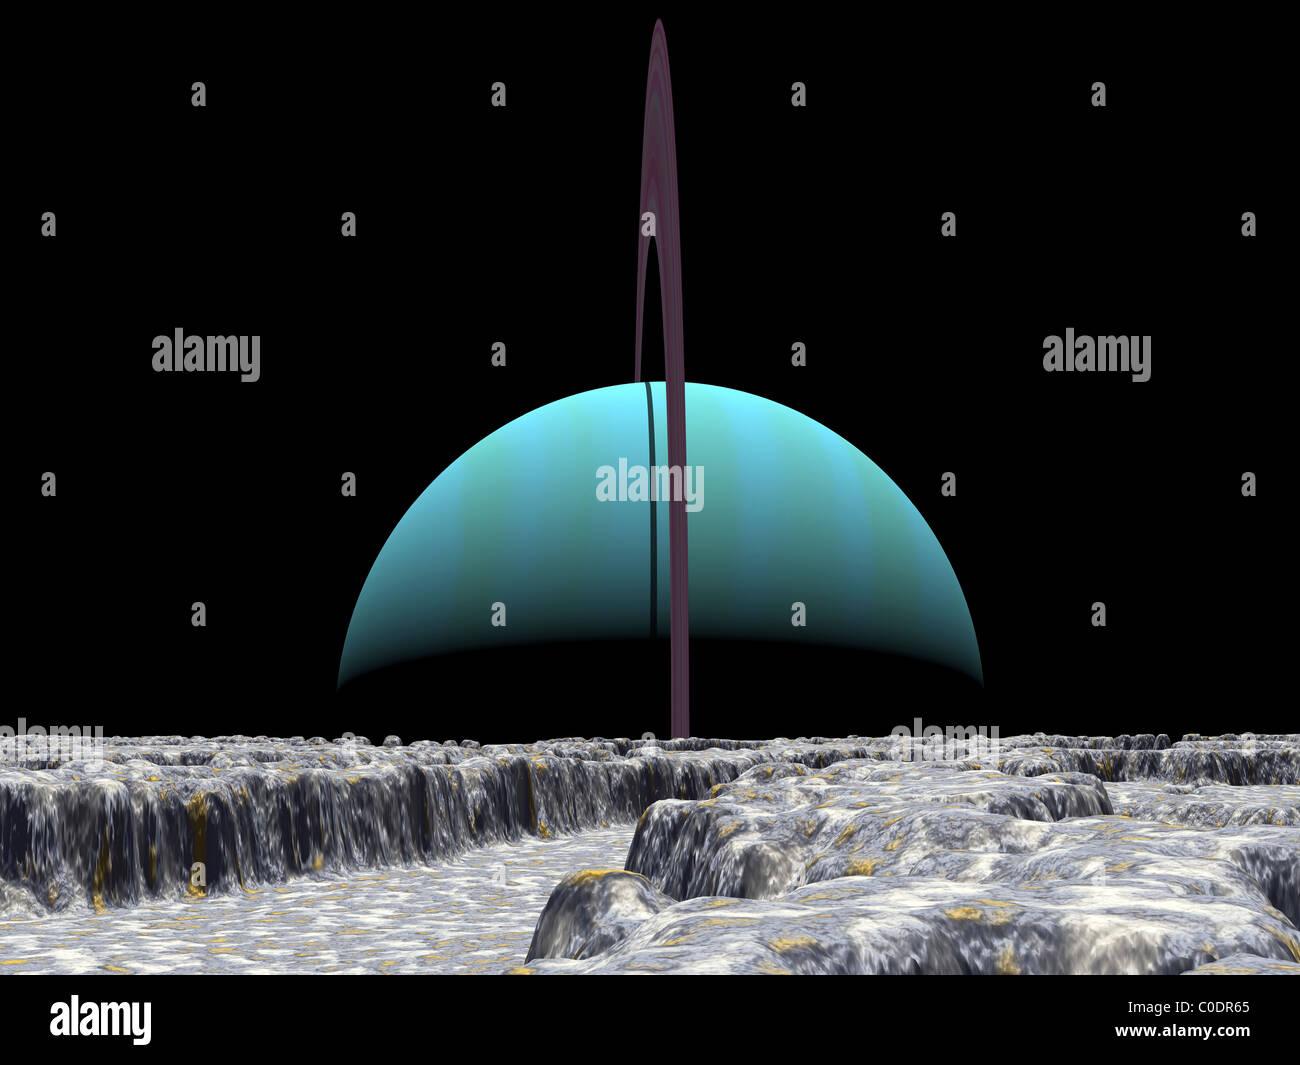 Illustration of the giant extrasolar planet 70 Virginis b. - Stock Image